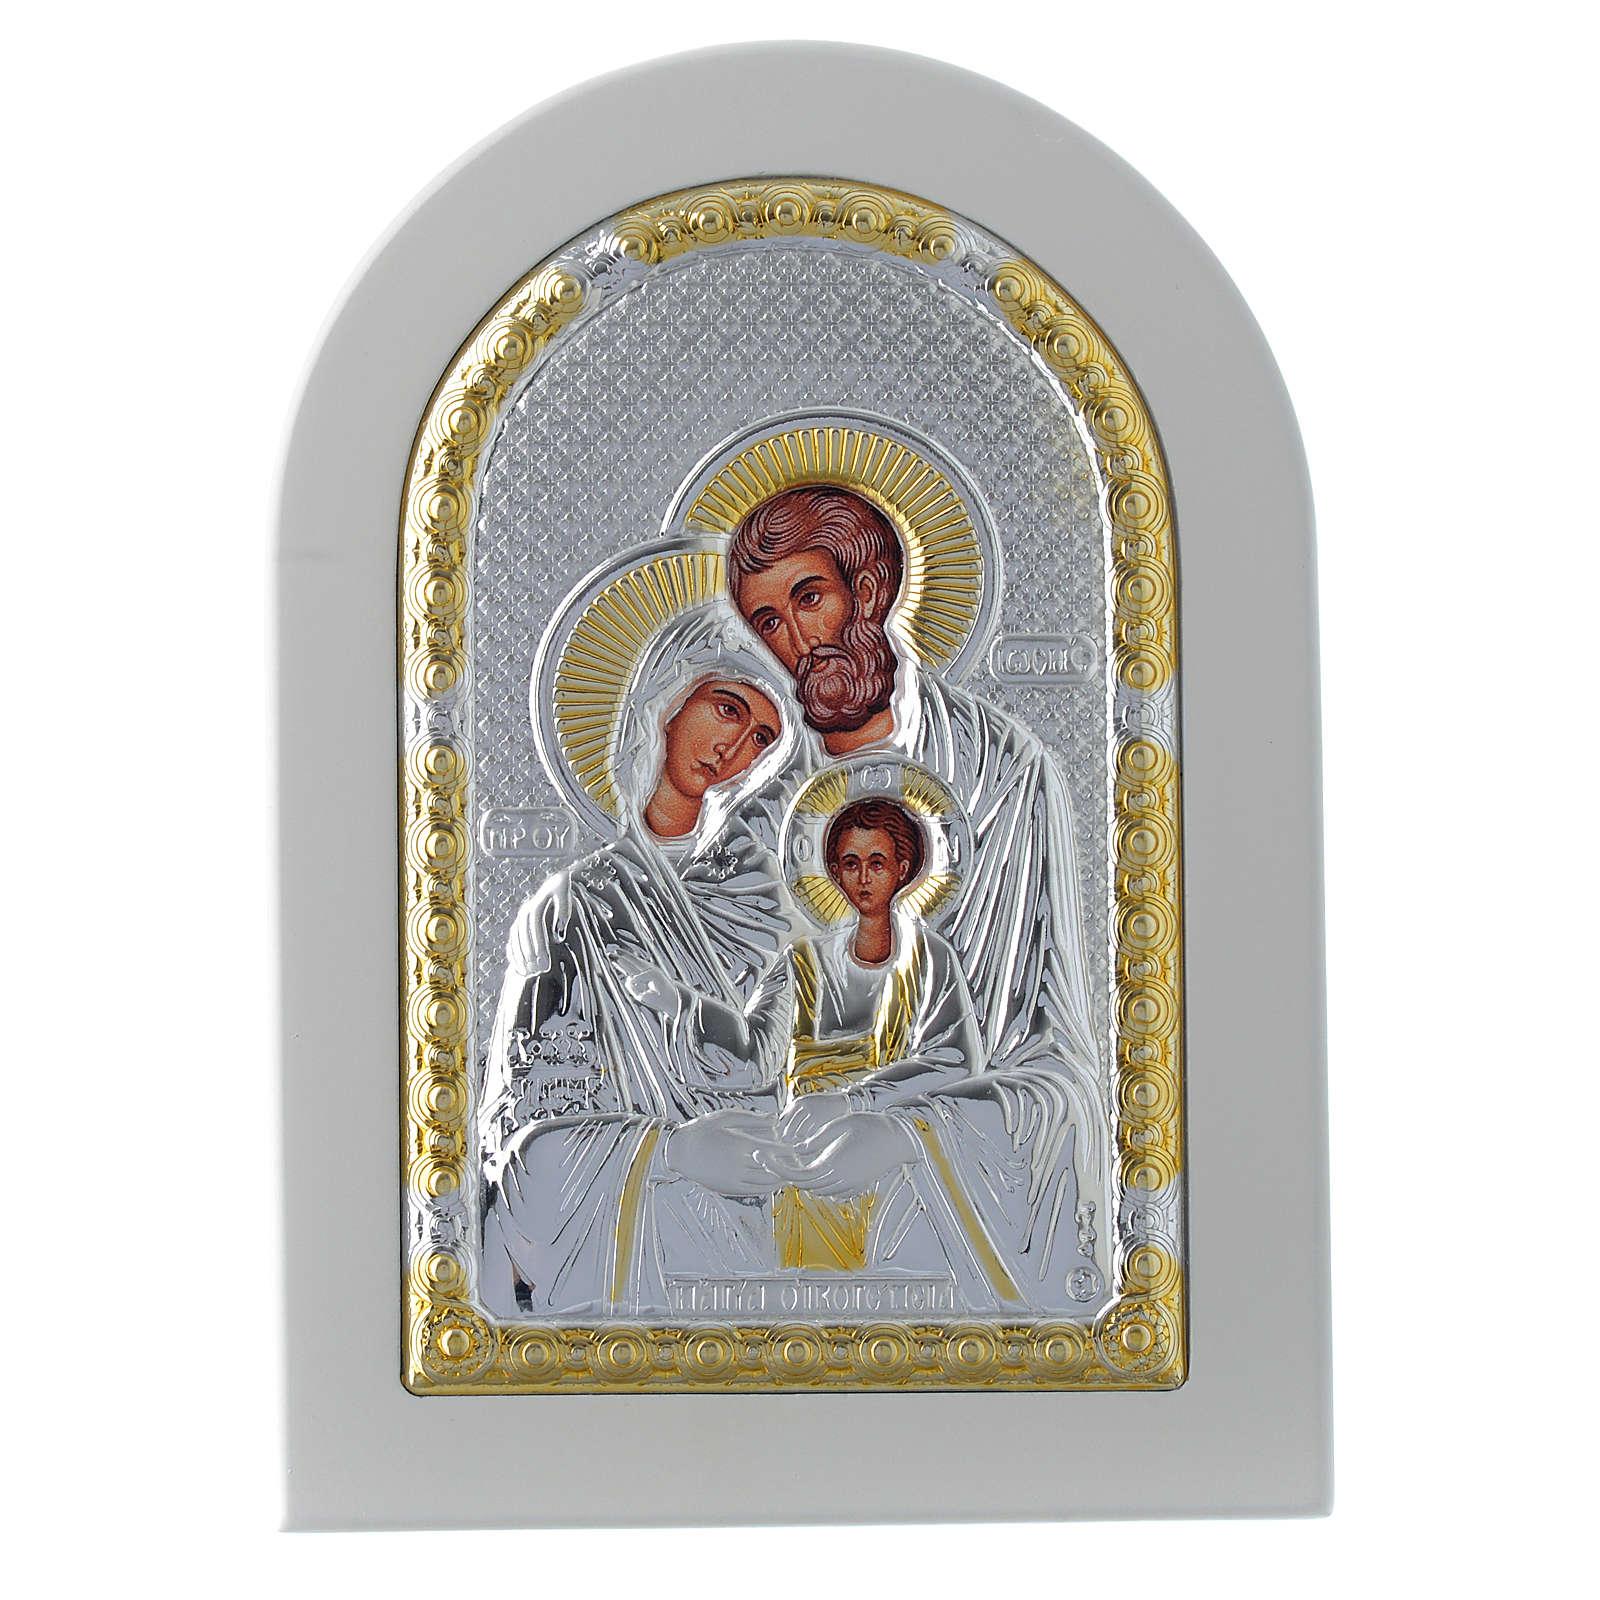 Icona Sacra Famiglia 14x10 cm argento 925 finiture dorate 4